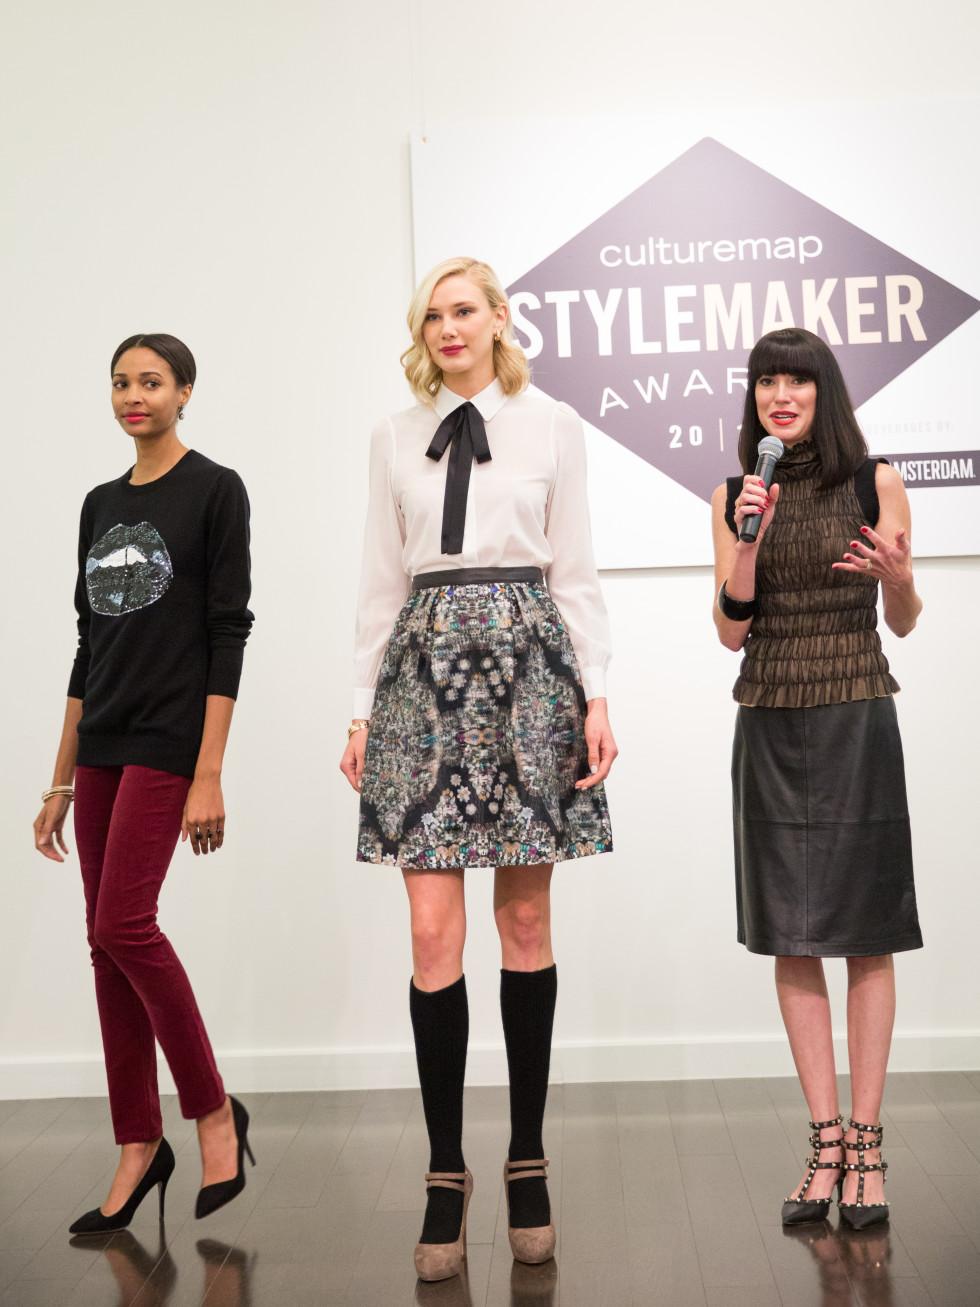 Nancy Koen at the Dallas Stylemaker Awards